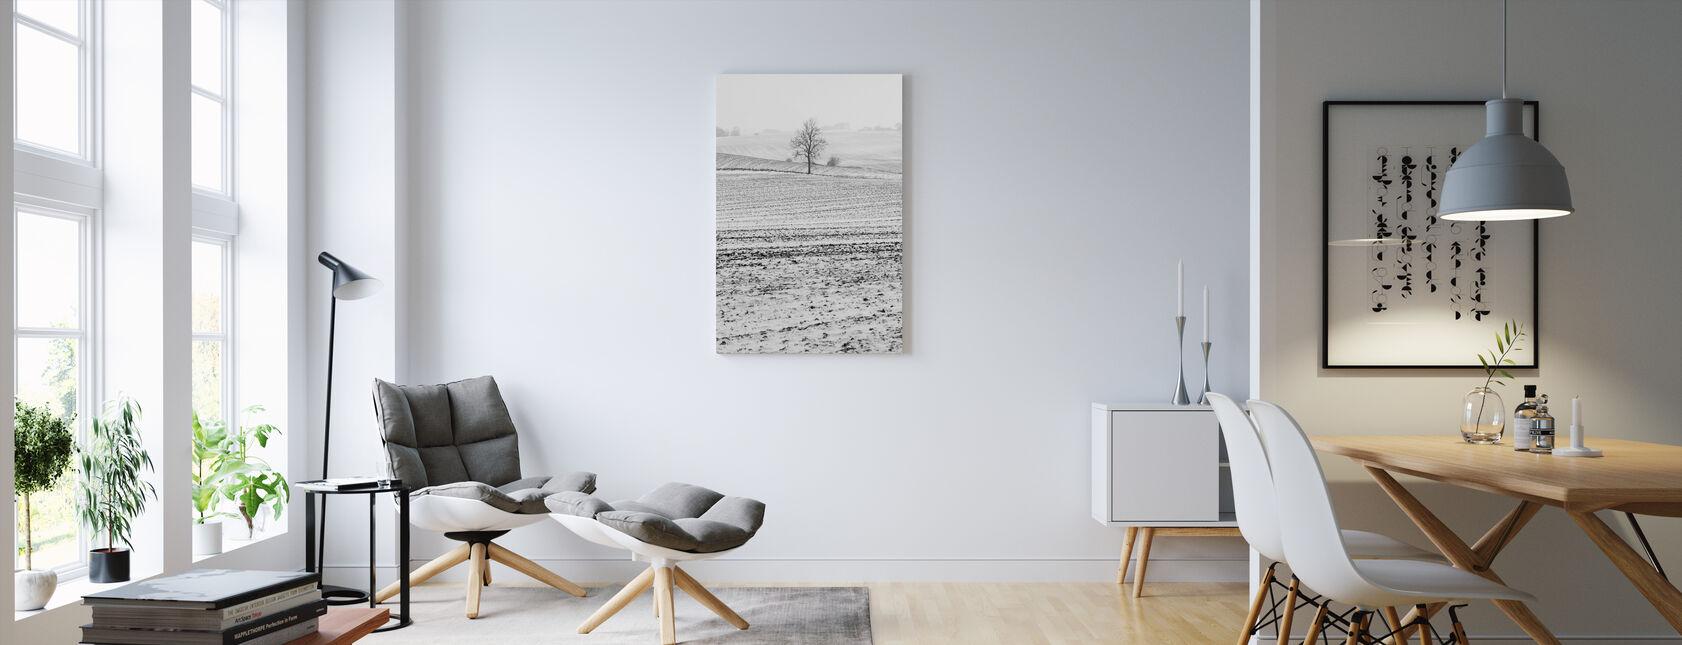 Fields in Anderslöv, Sweden - Canvas print - Living Room